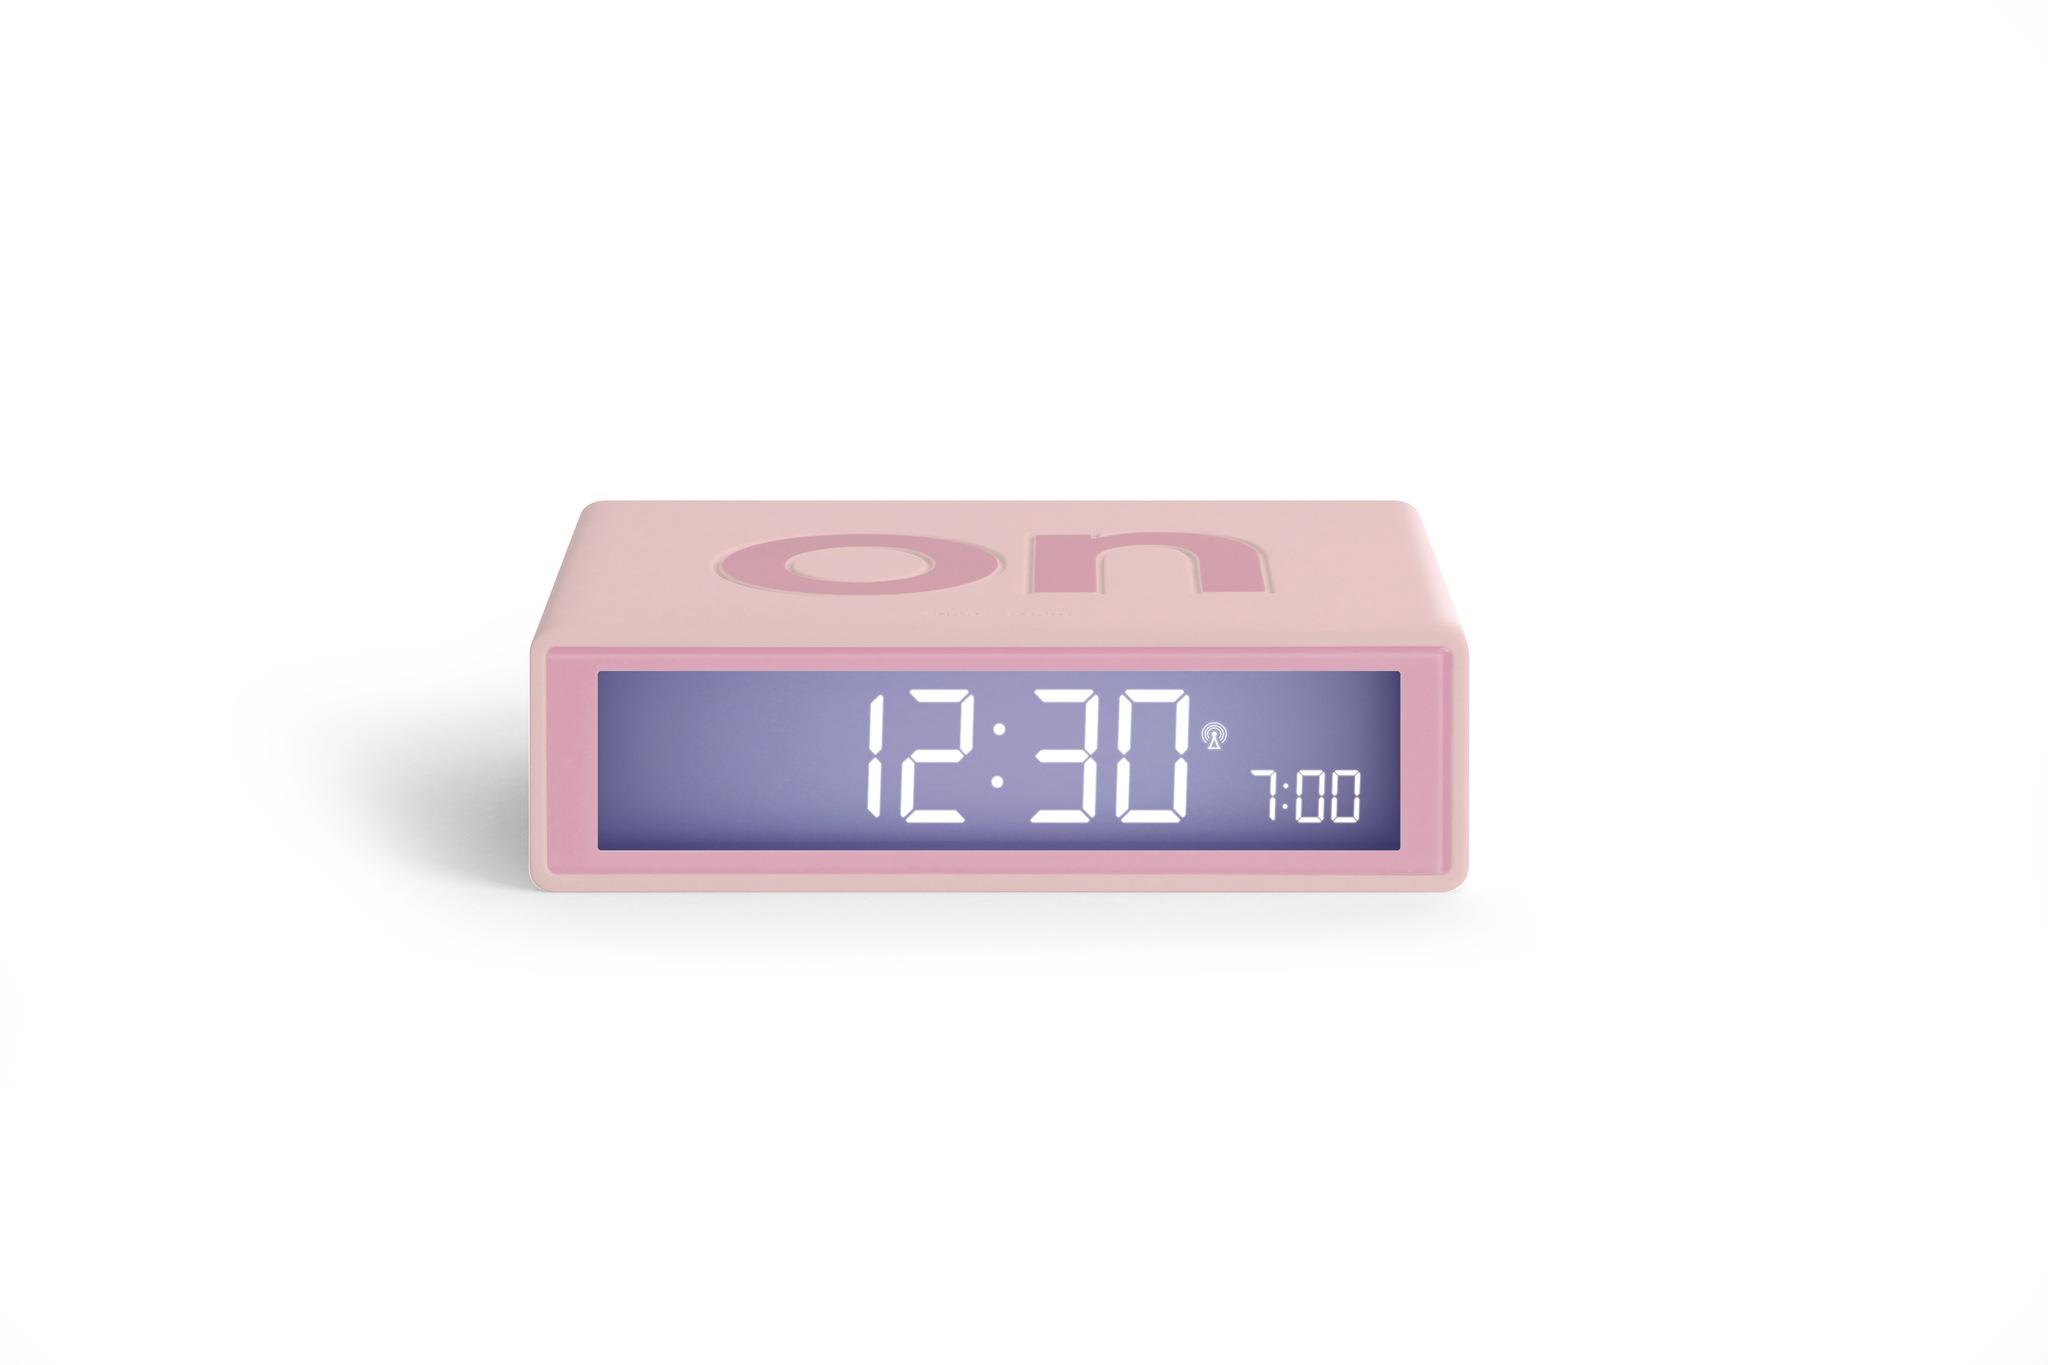 pink, funkgesteuert, LCD Display, snooze